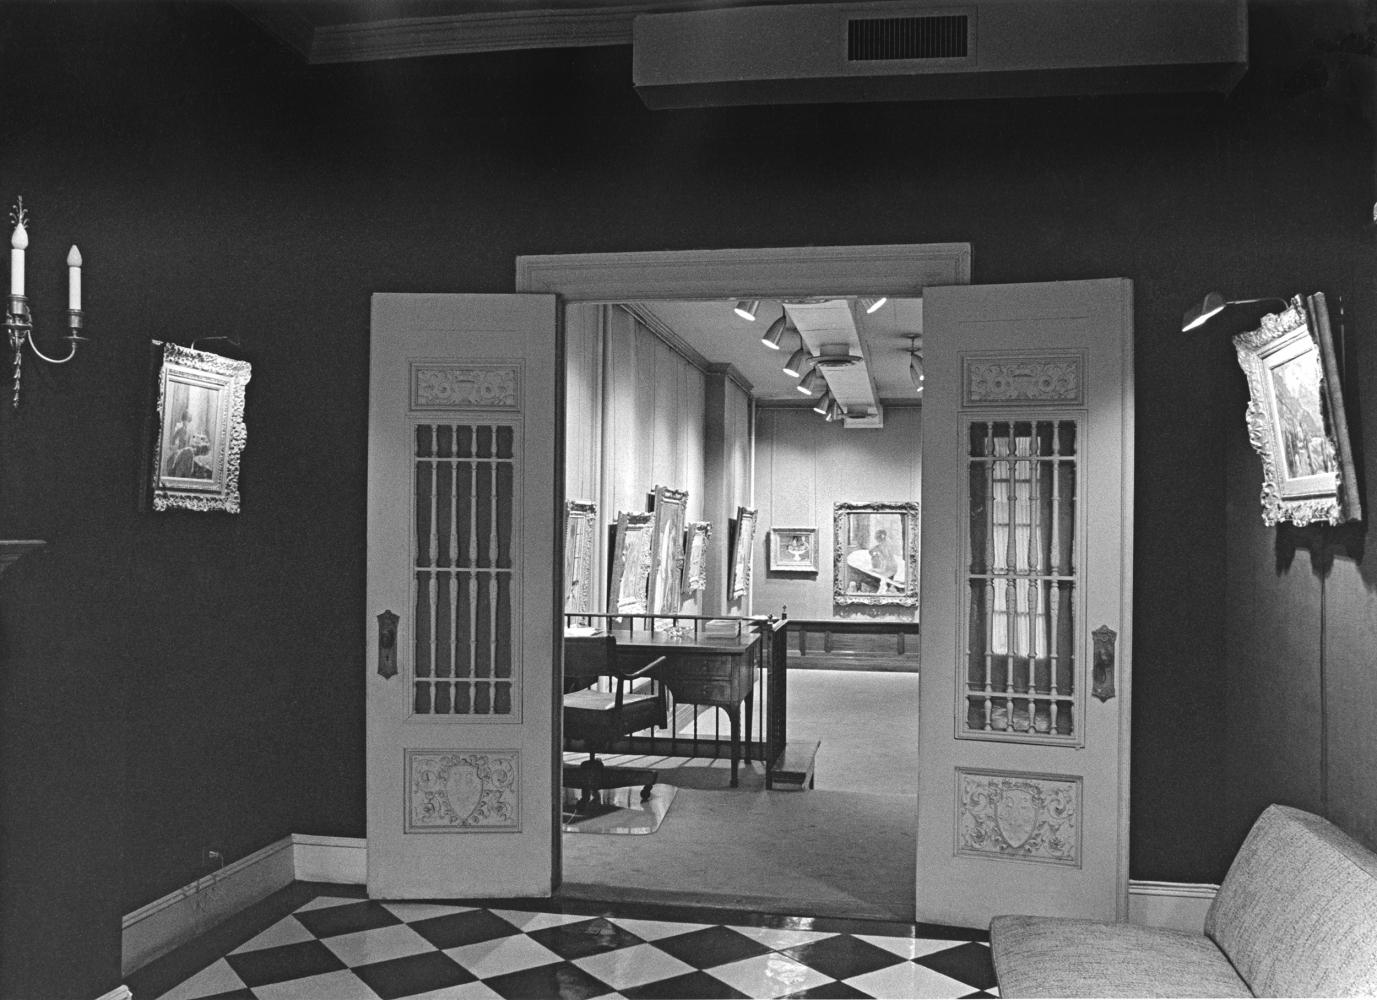 Installation view of Bonnard show